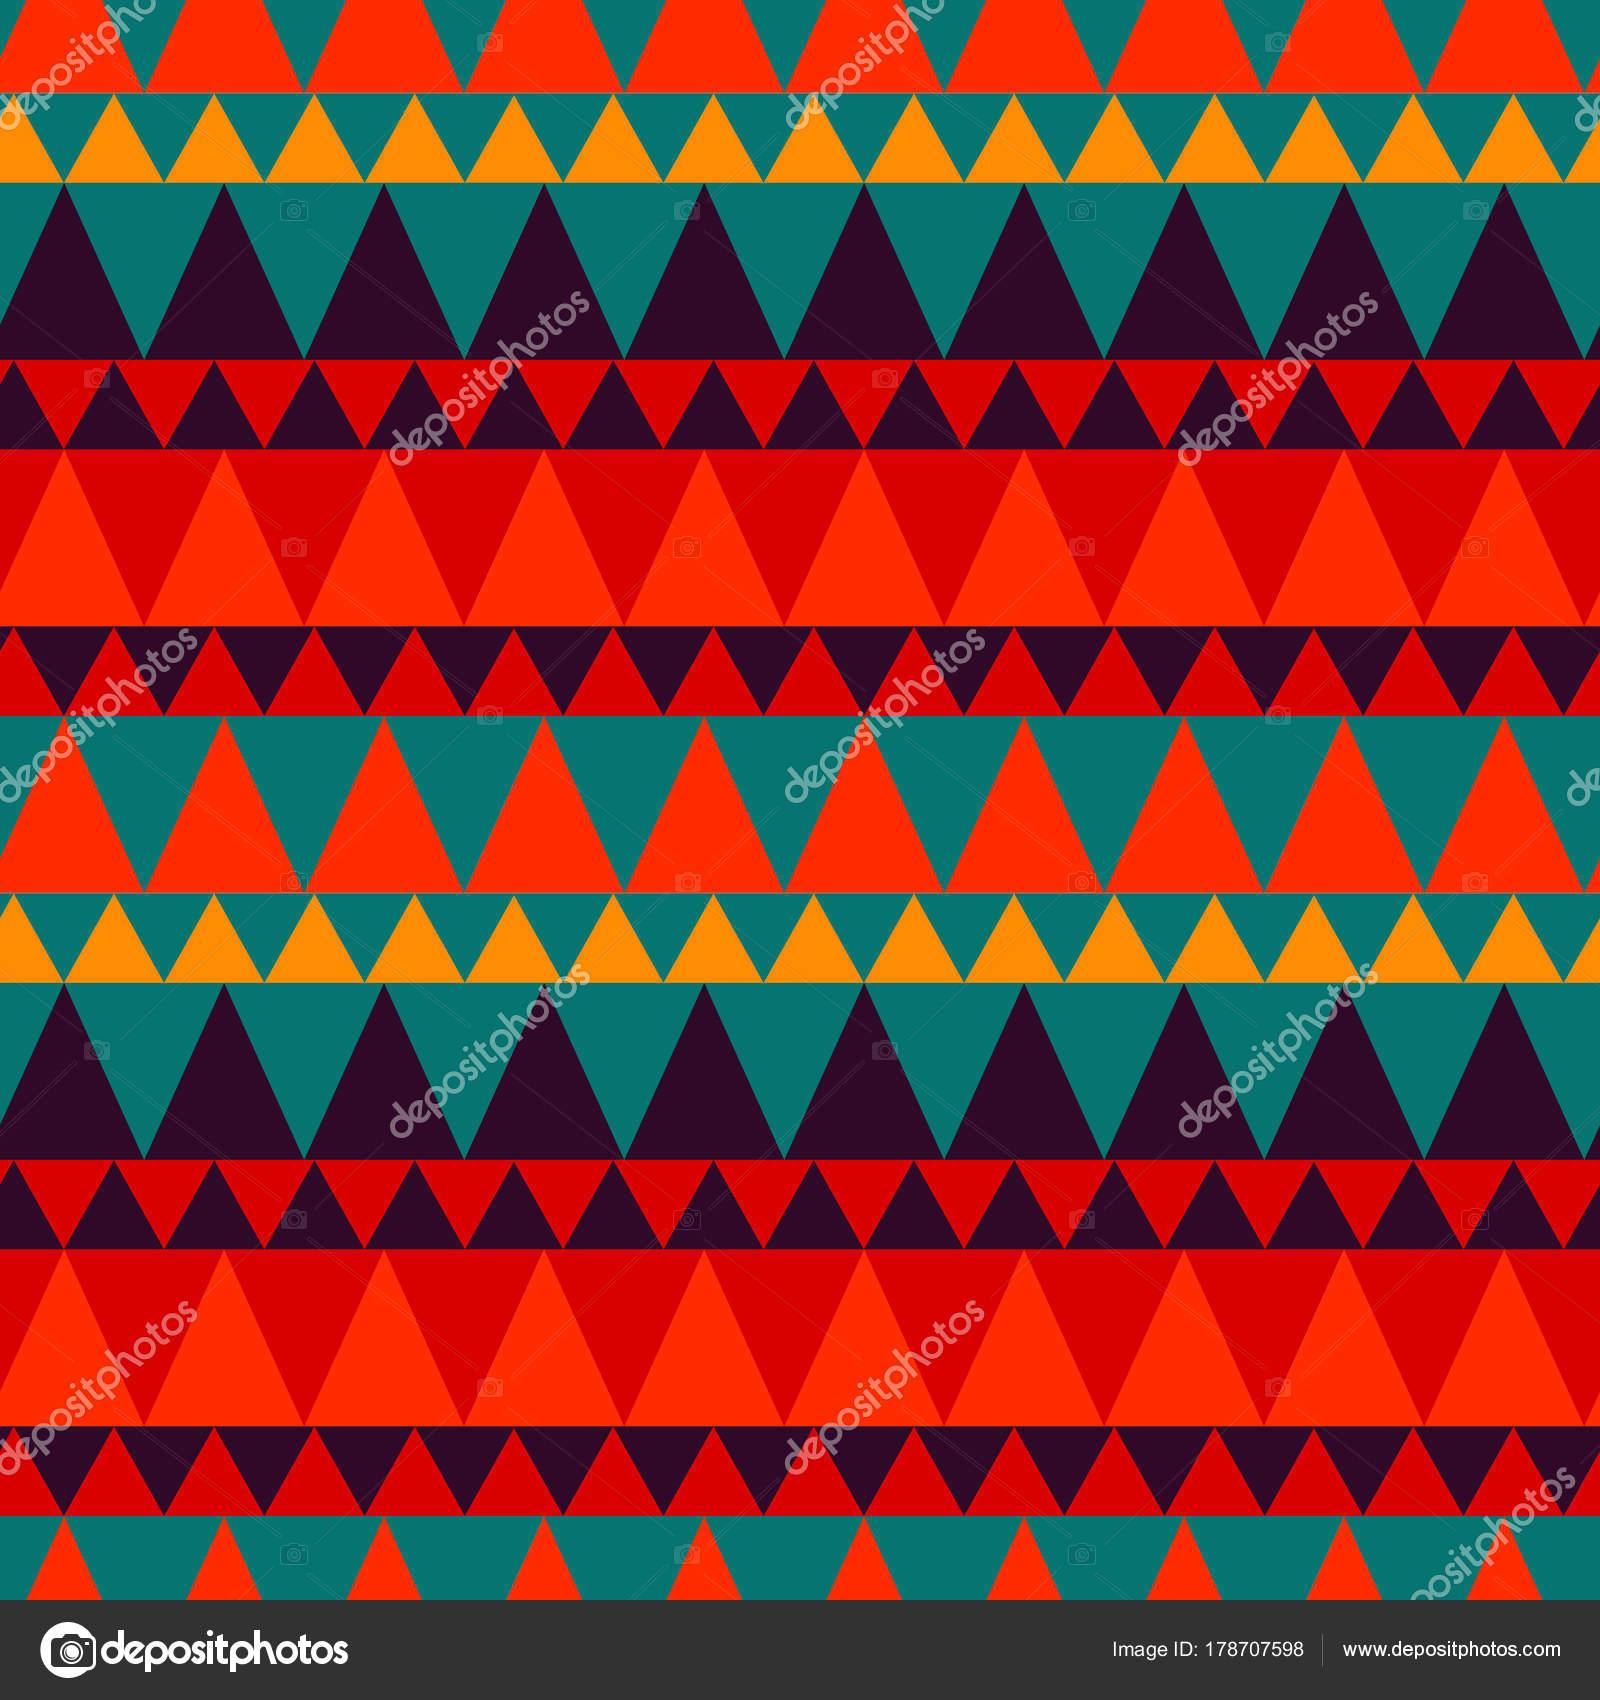 Wonderful Wallpaper Mountain Pattern - depositphotos_178707598-stock-illustration-triangular-forest-mountain-seamless-pattern  Gallery_705370.jpg